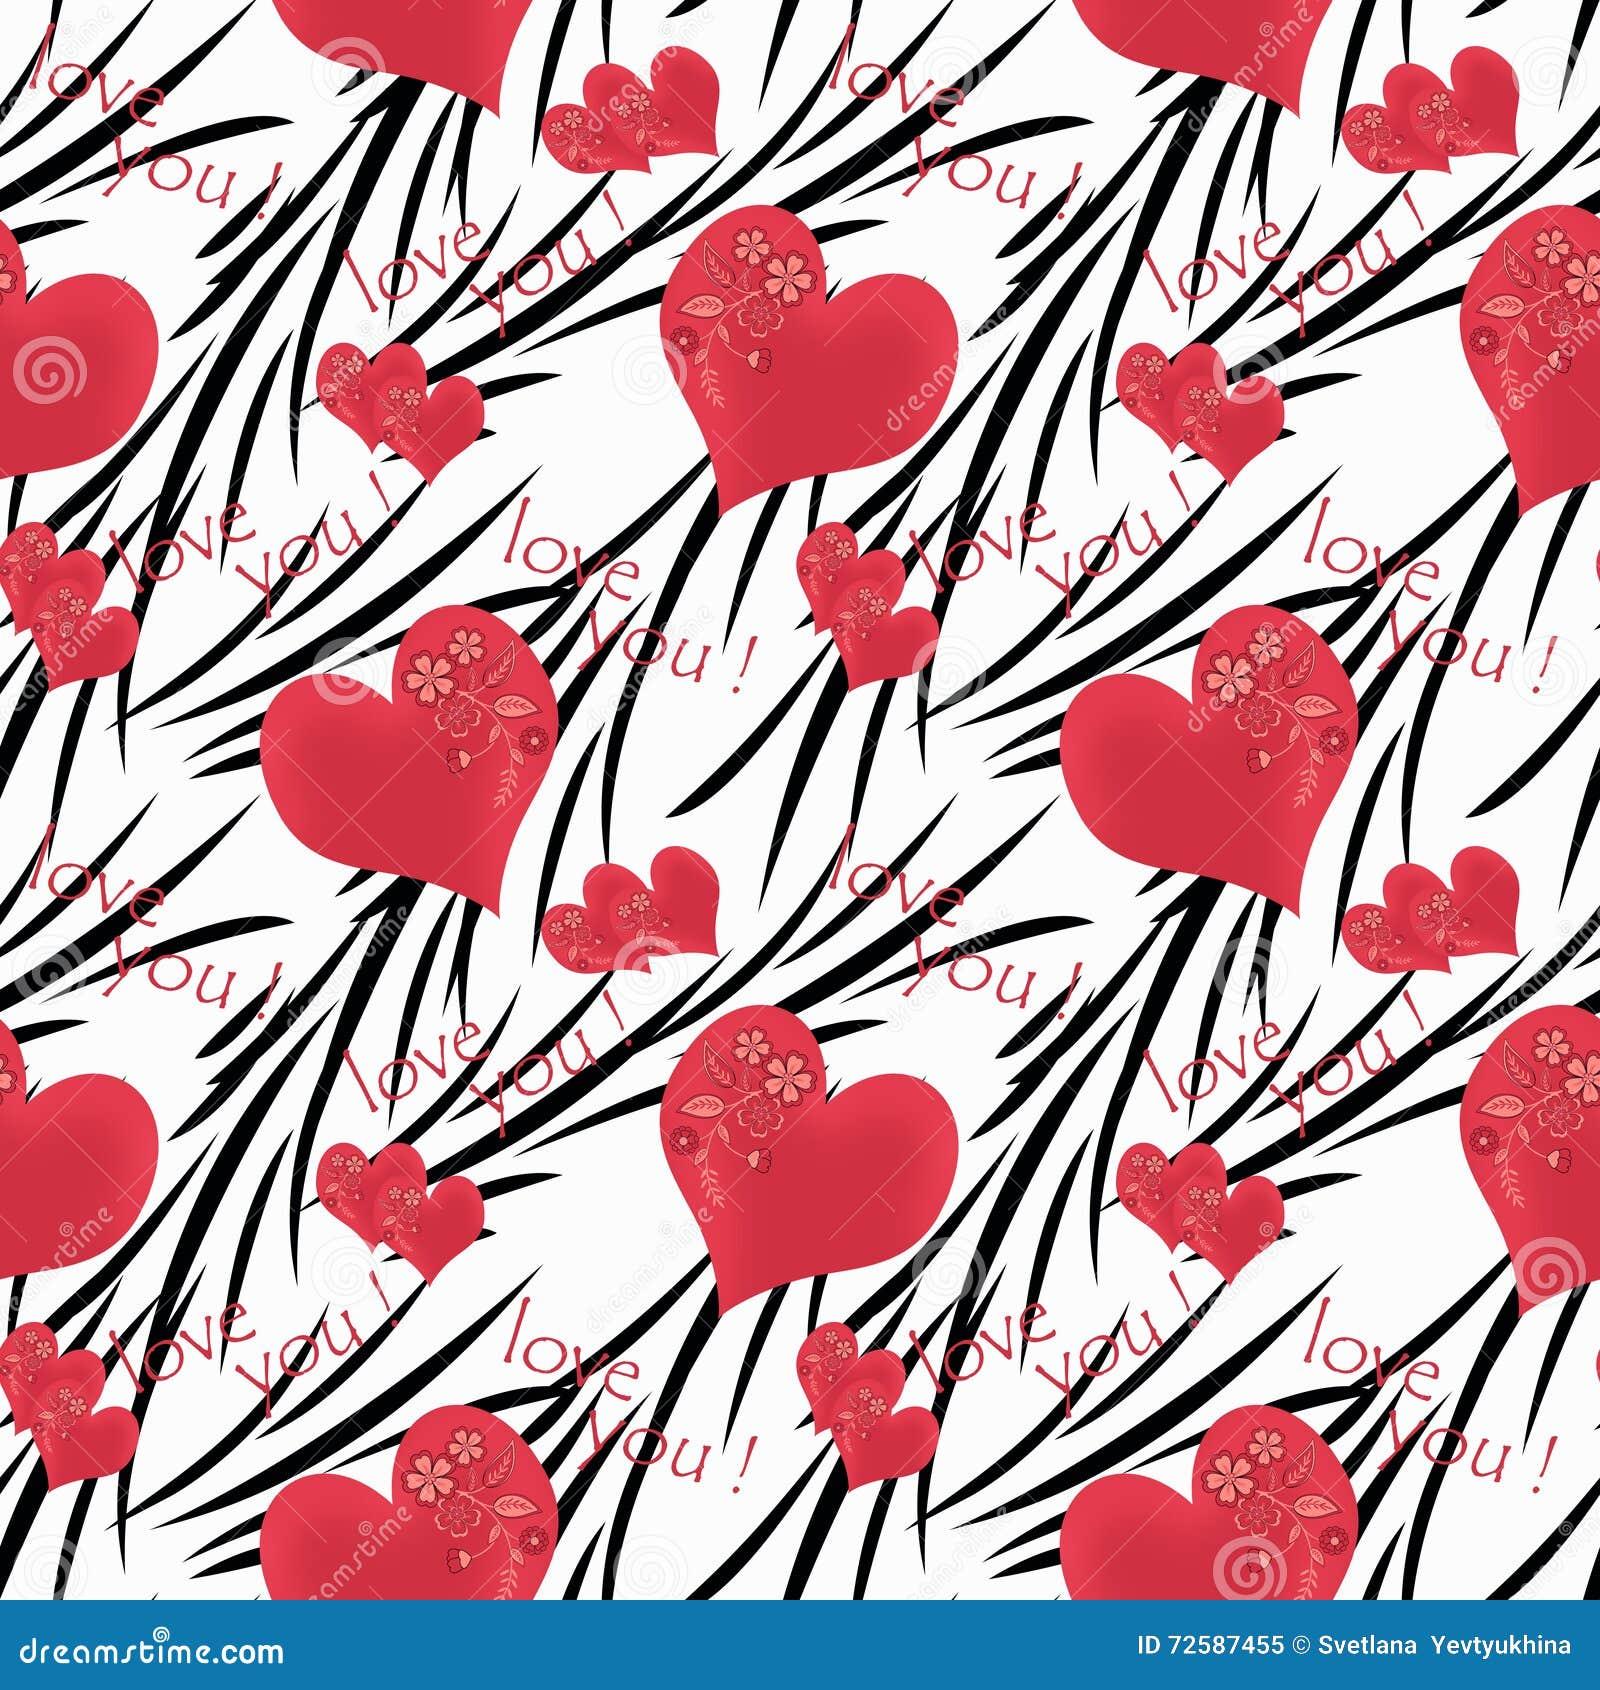 Seamless Pattern Cute Cartoon Flowers Hearts White Background